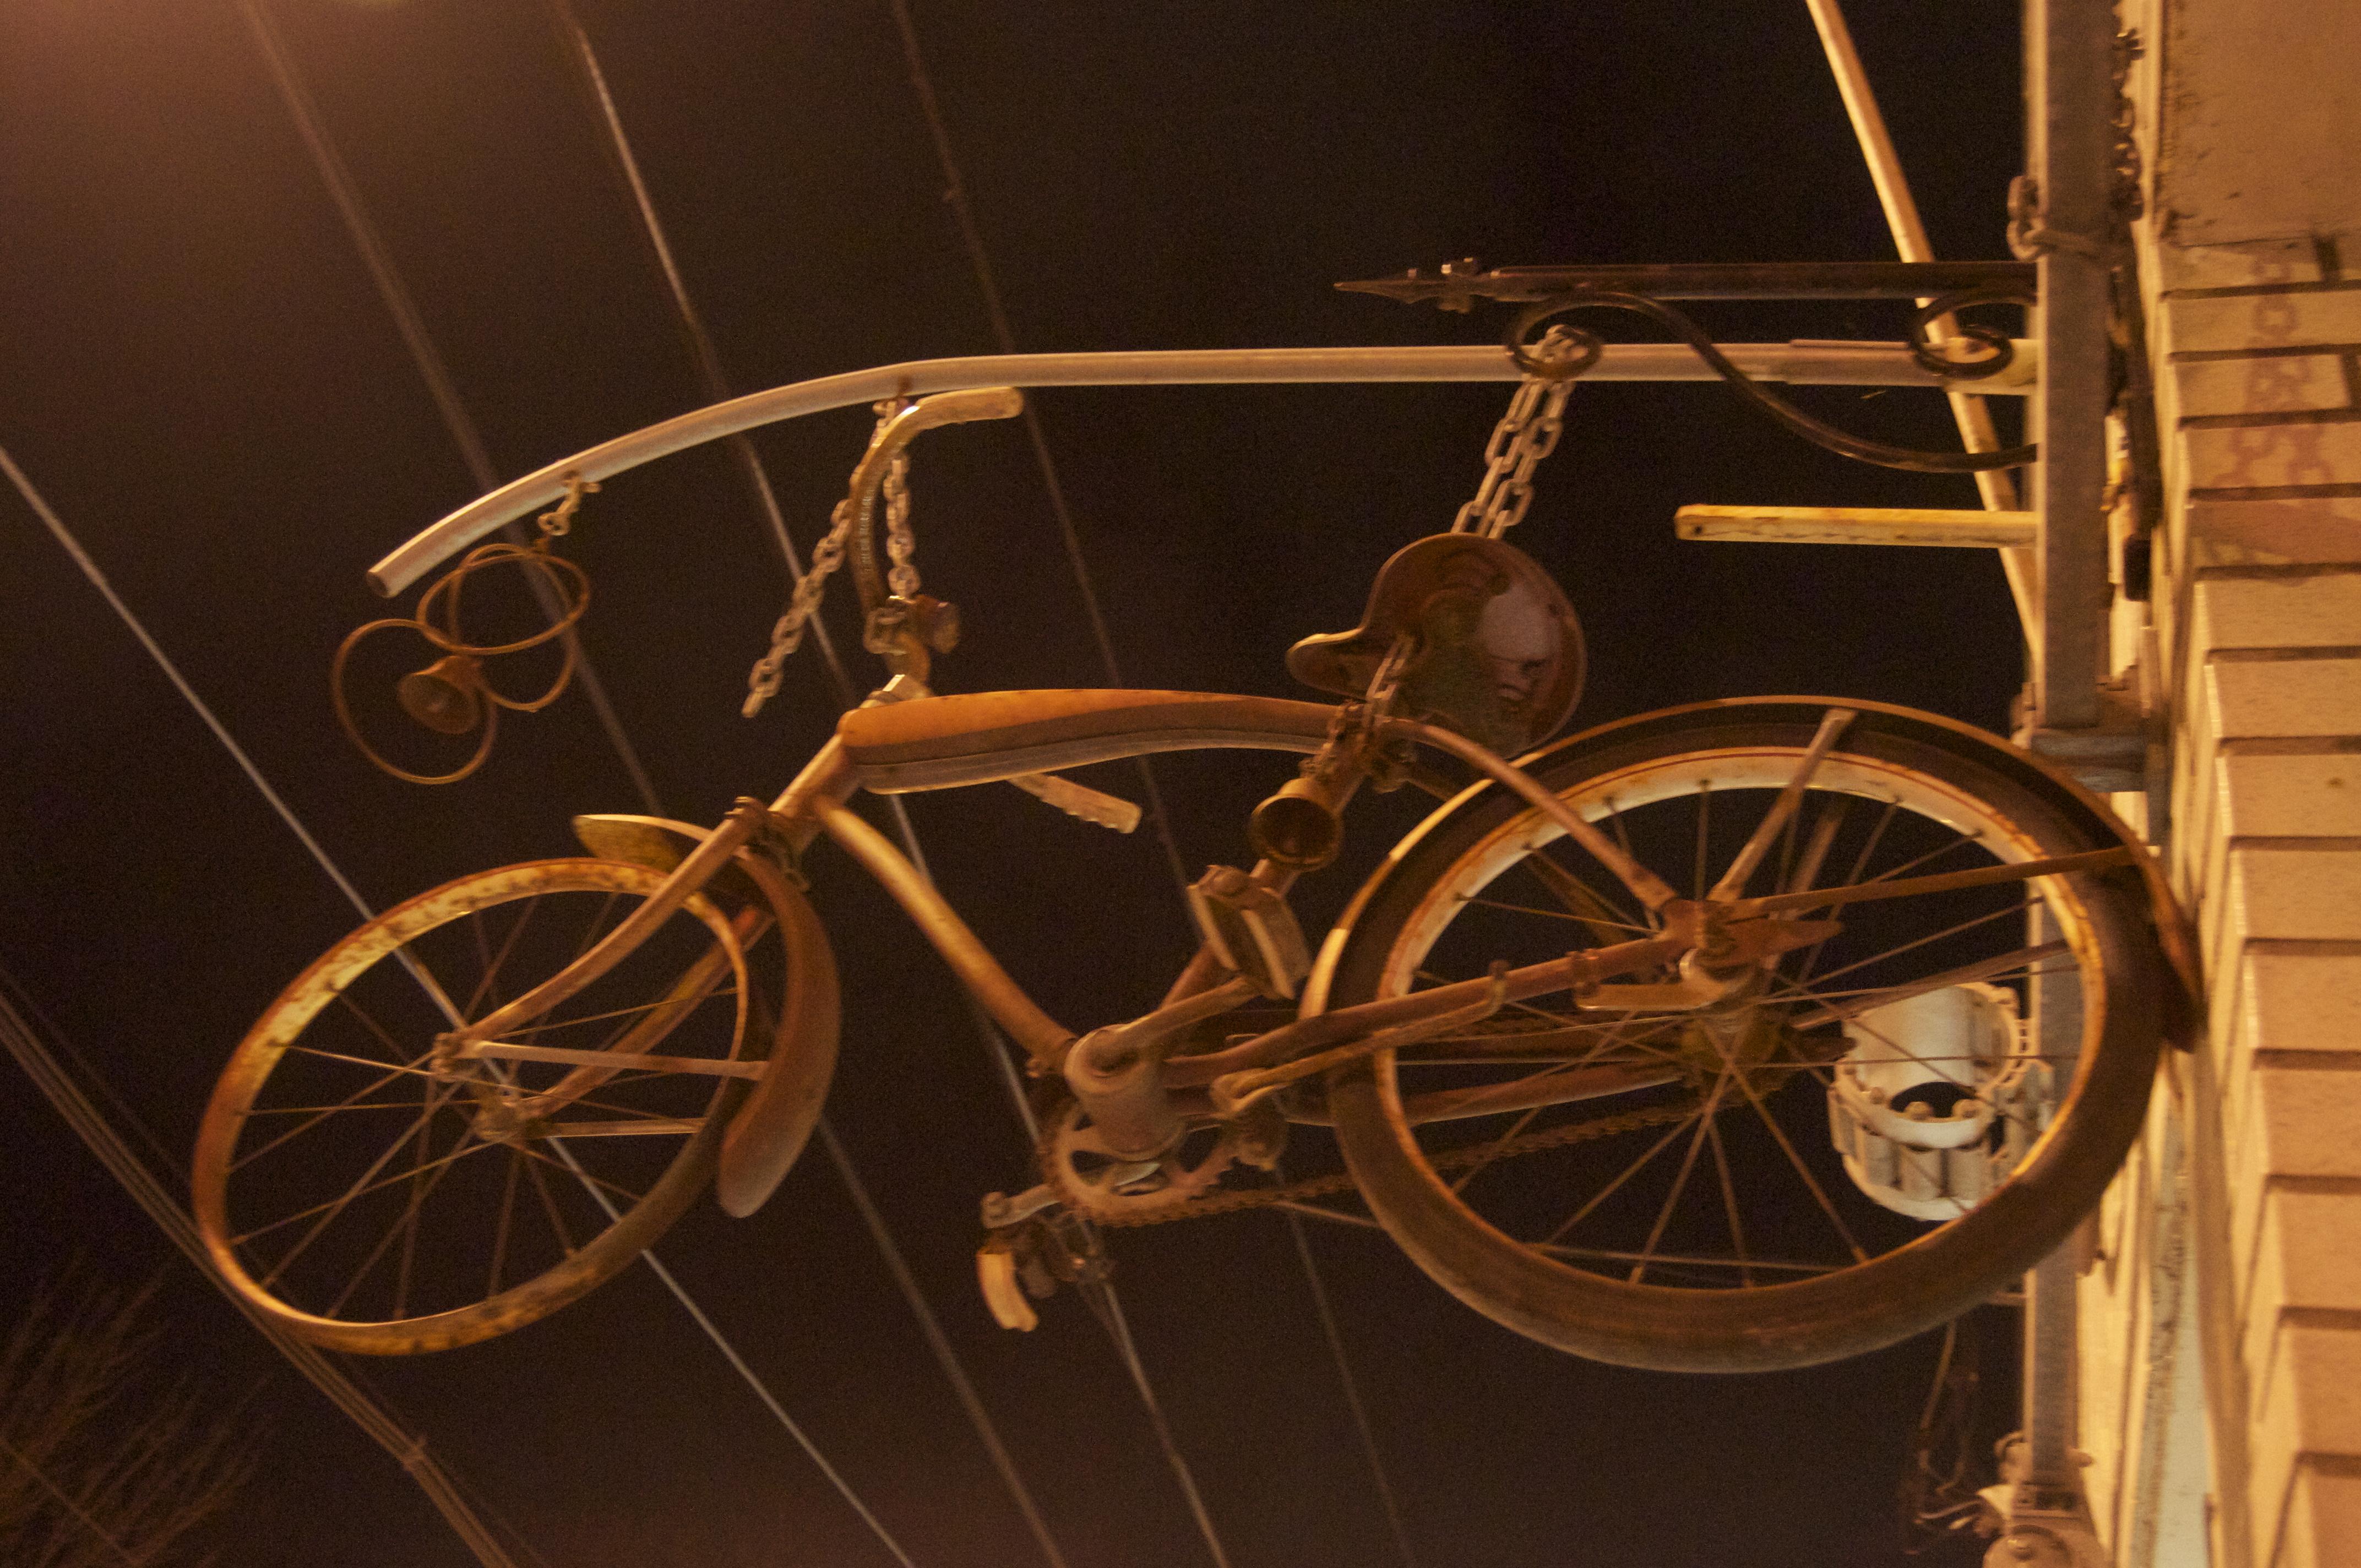 Queen Bicycle